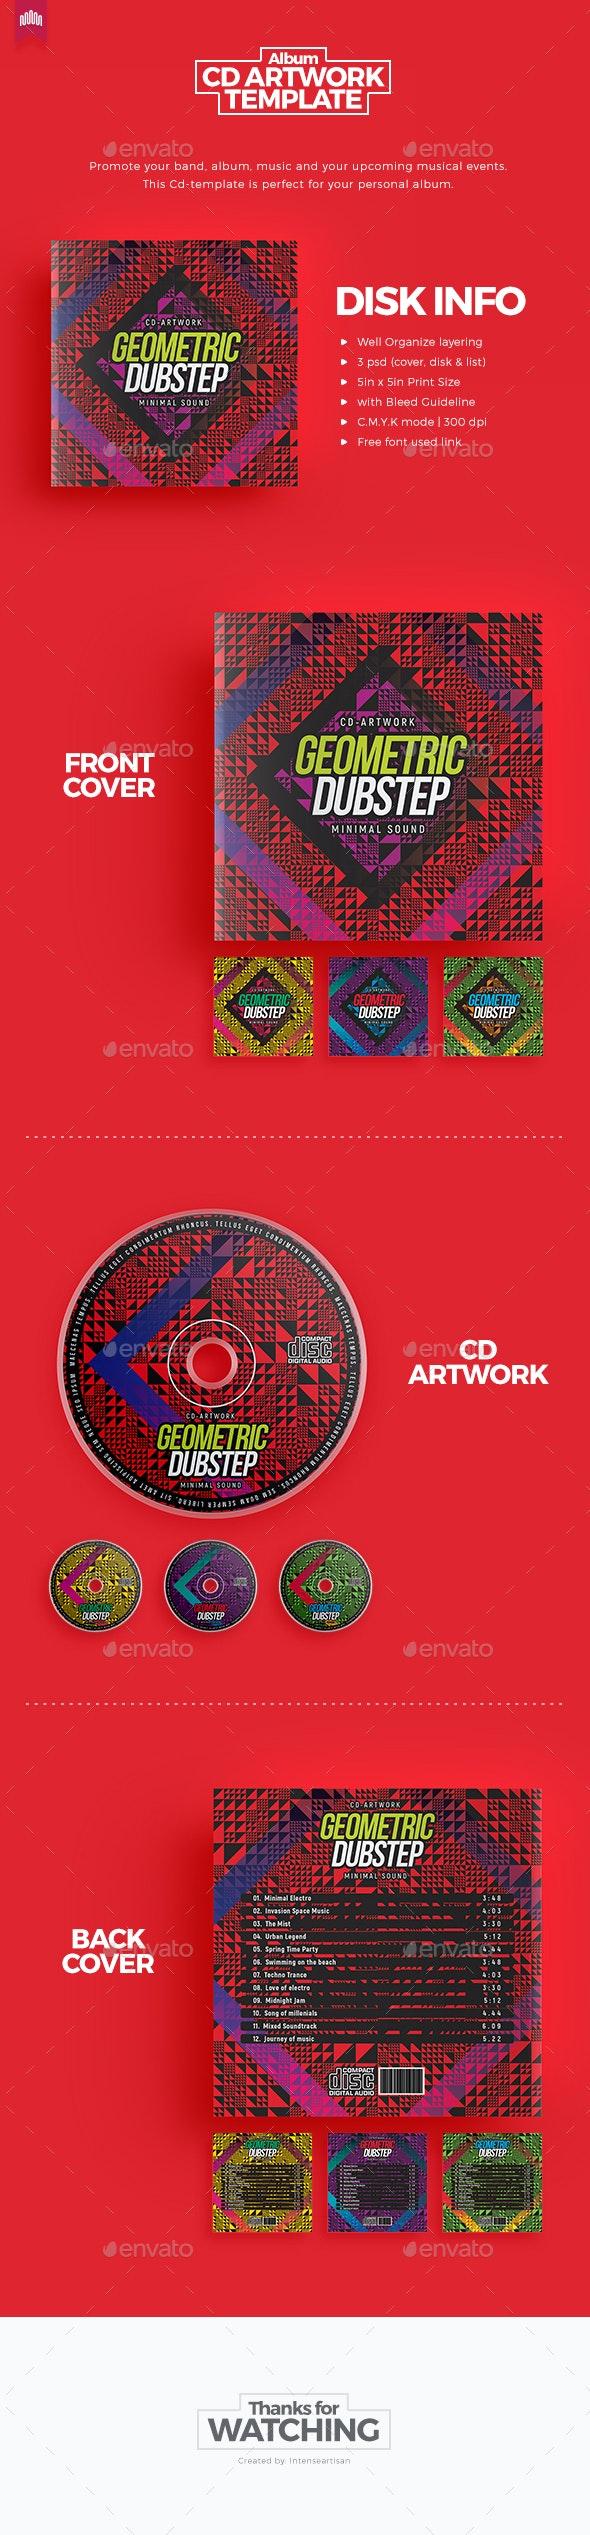 Geometric Dubstep - CD Artwork - CD & DVD Artwork Print Templates